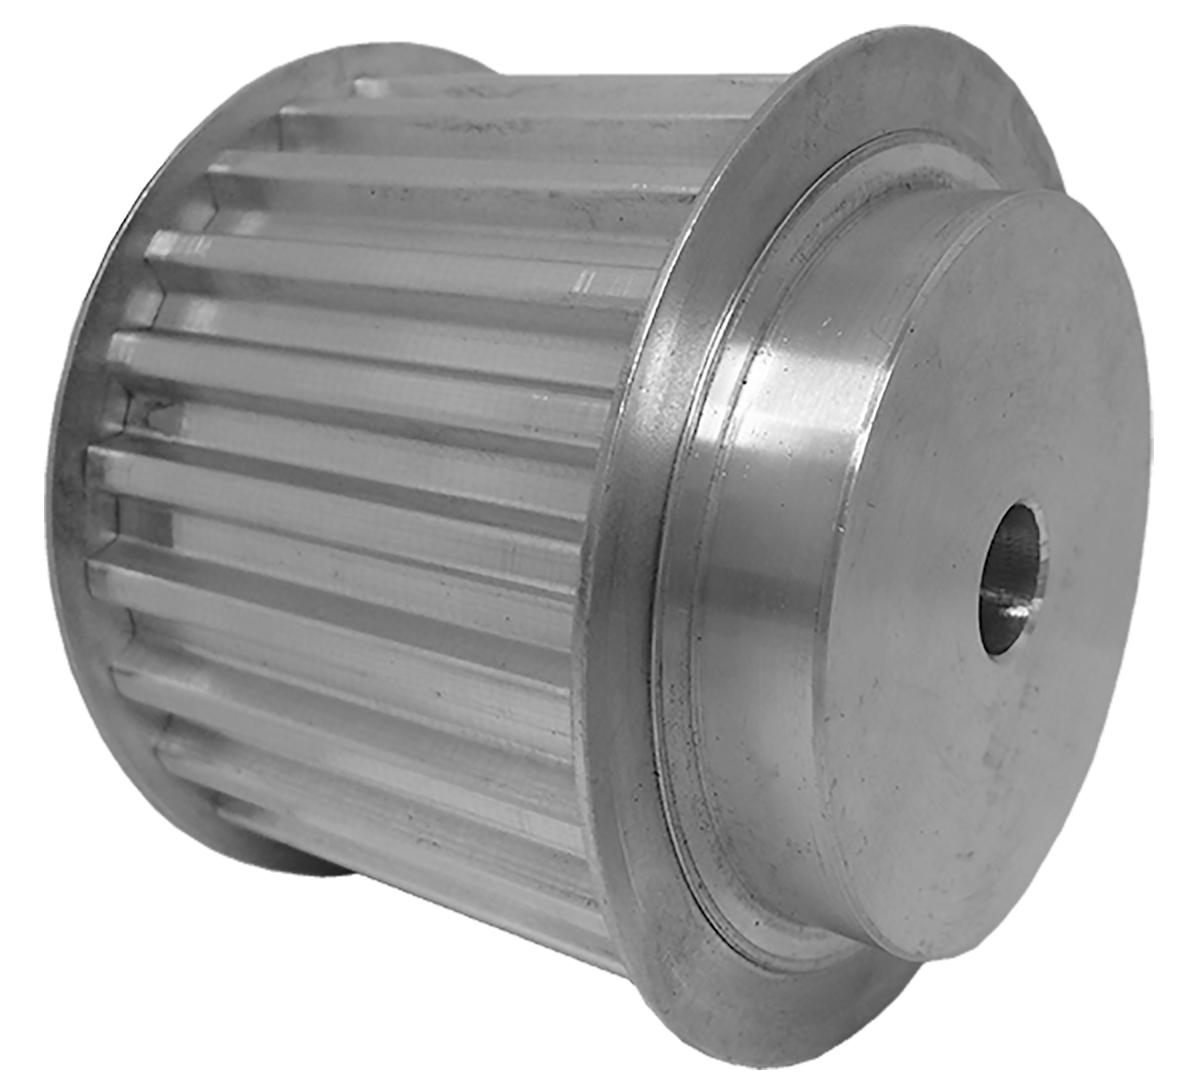 66T10/25-2 - Aluminum Metric Pulleys